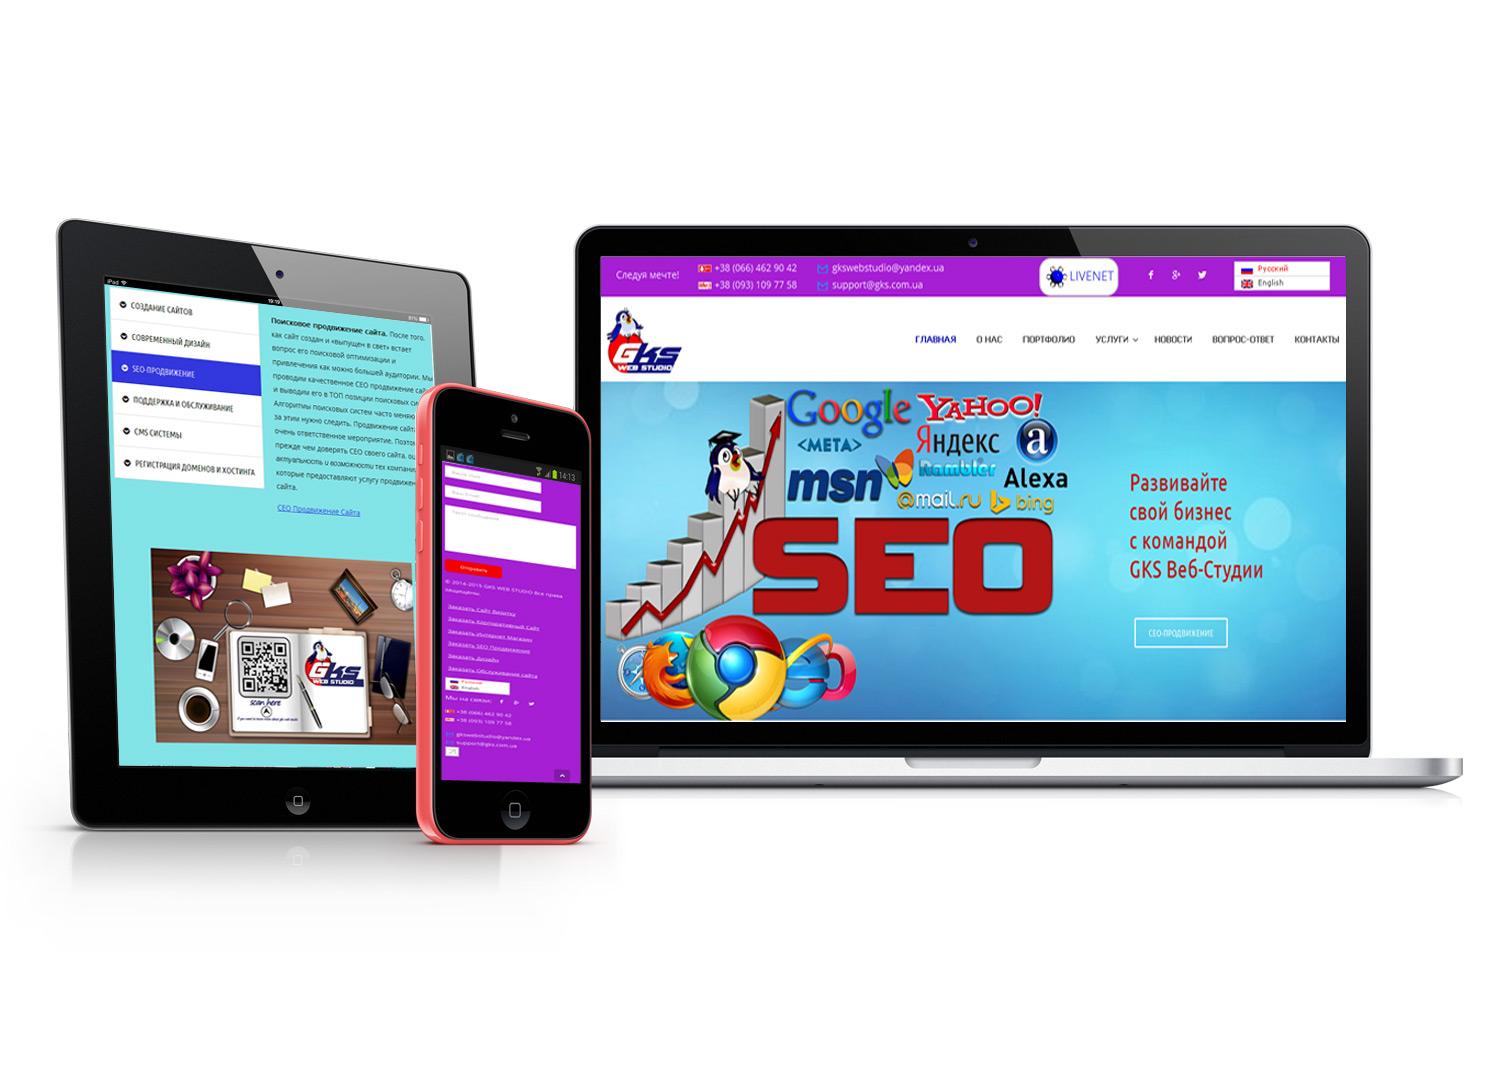 SEO GKS Web Studio site